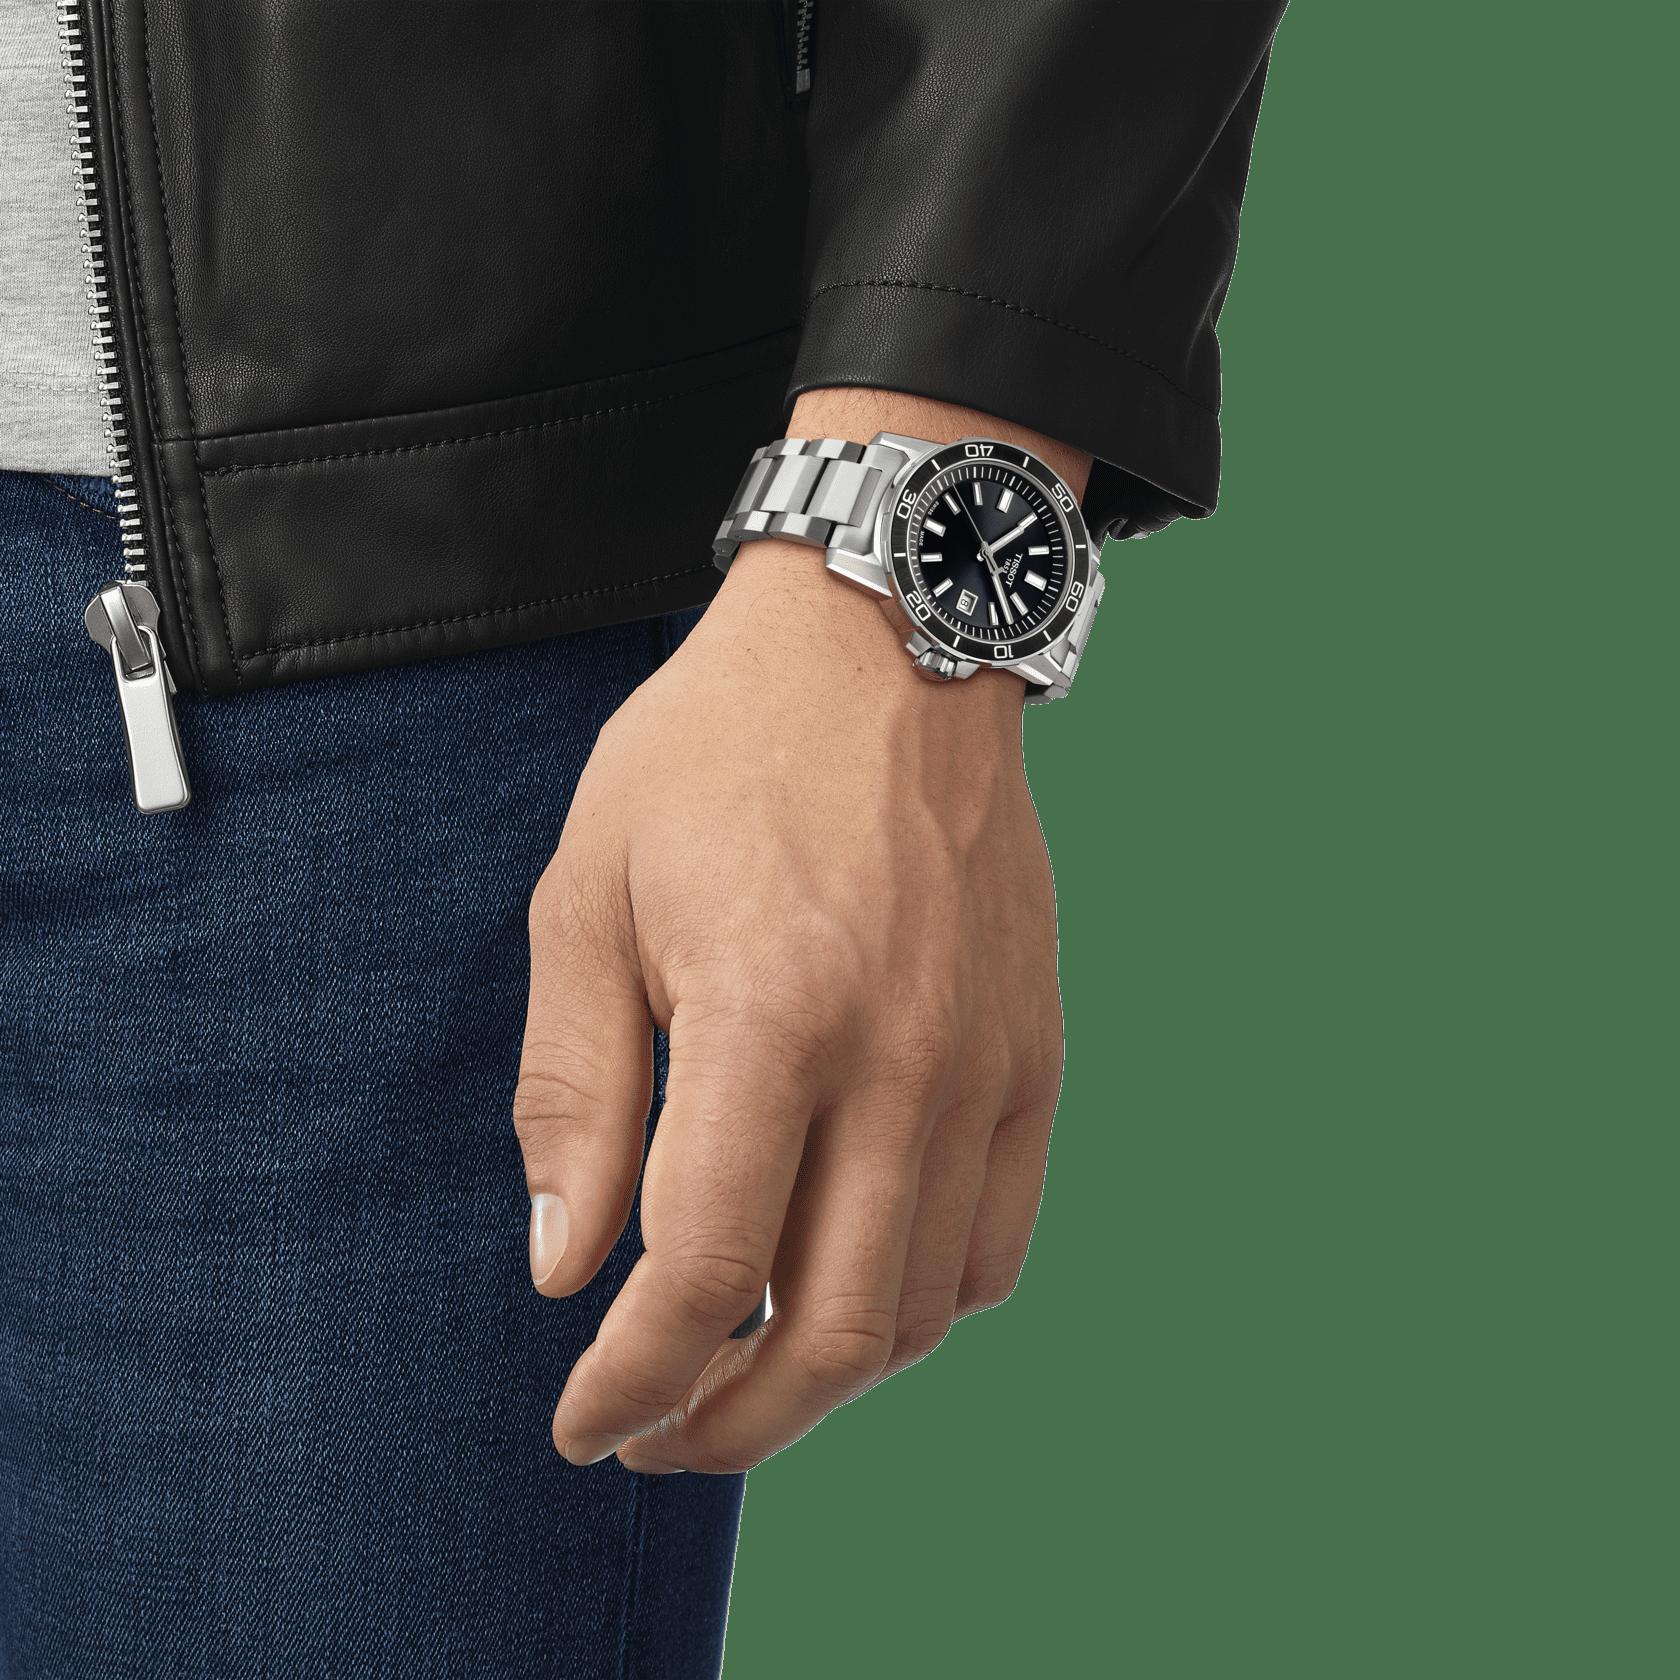 Tissot - Horloge Heren - Supersport - T1256101105100-2